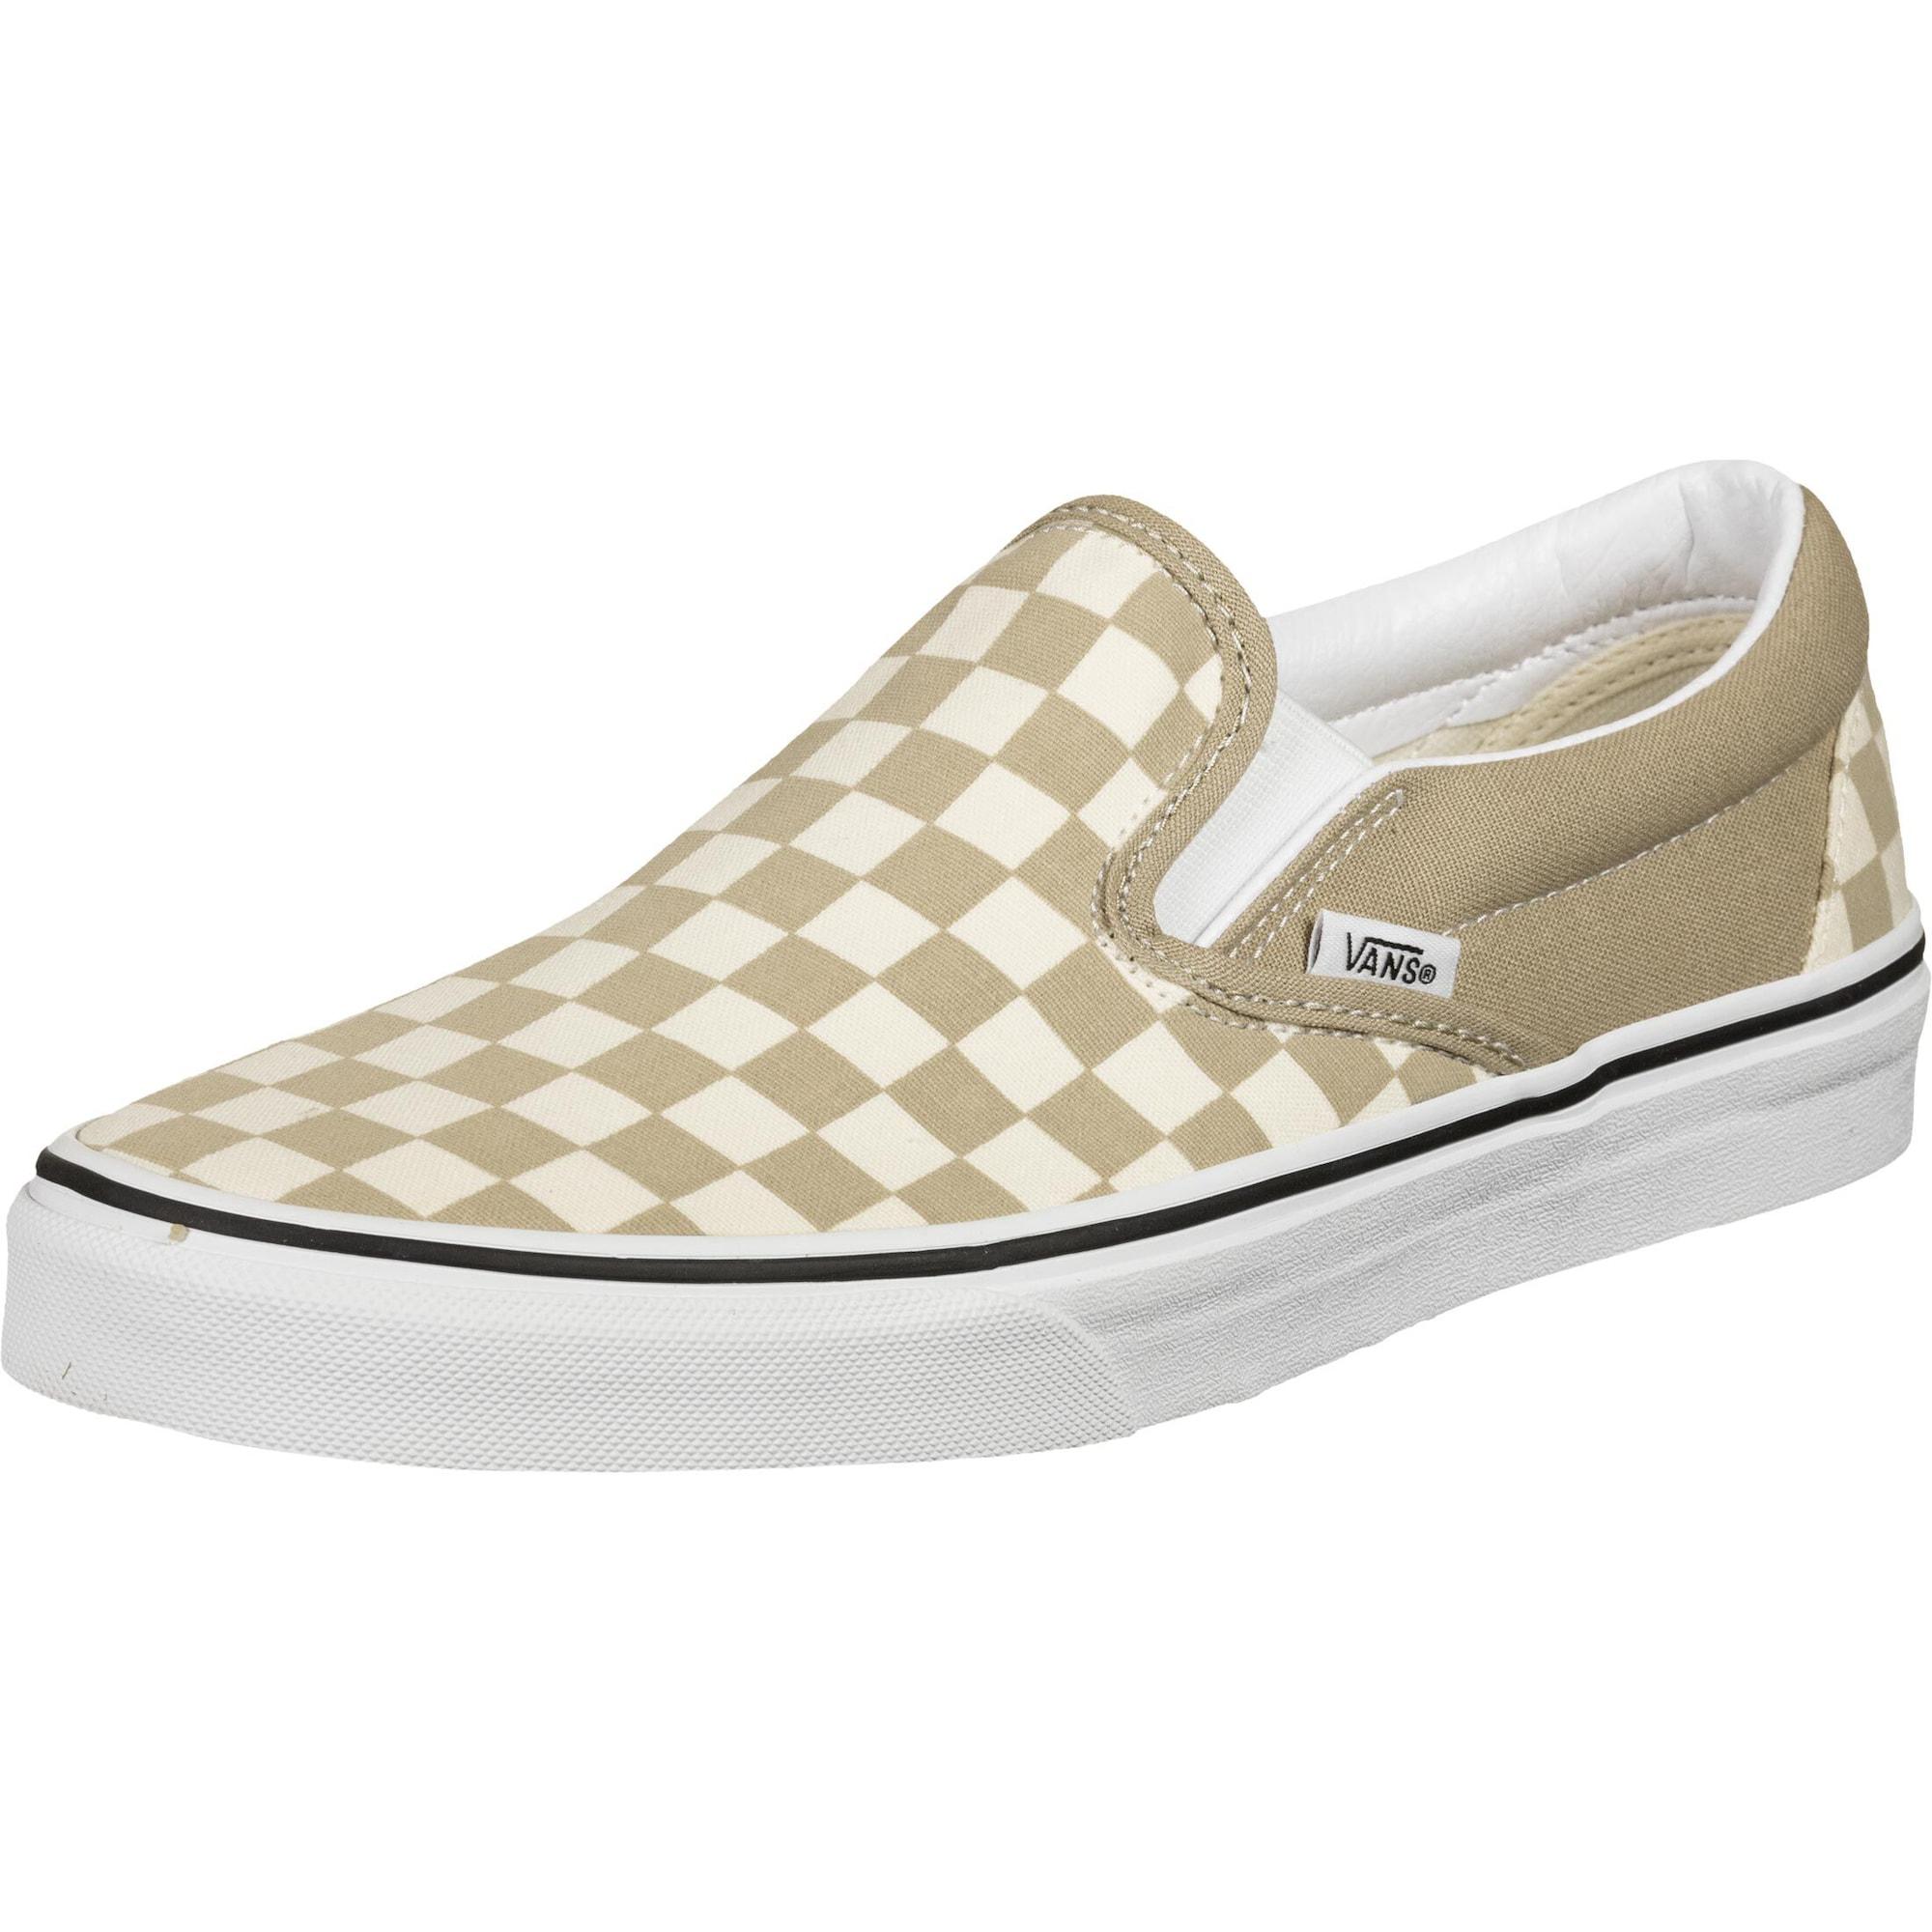 VANS Slip-on obuv 'UA Classic'  nebielená / biela.